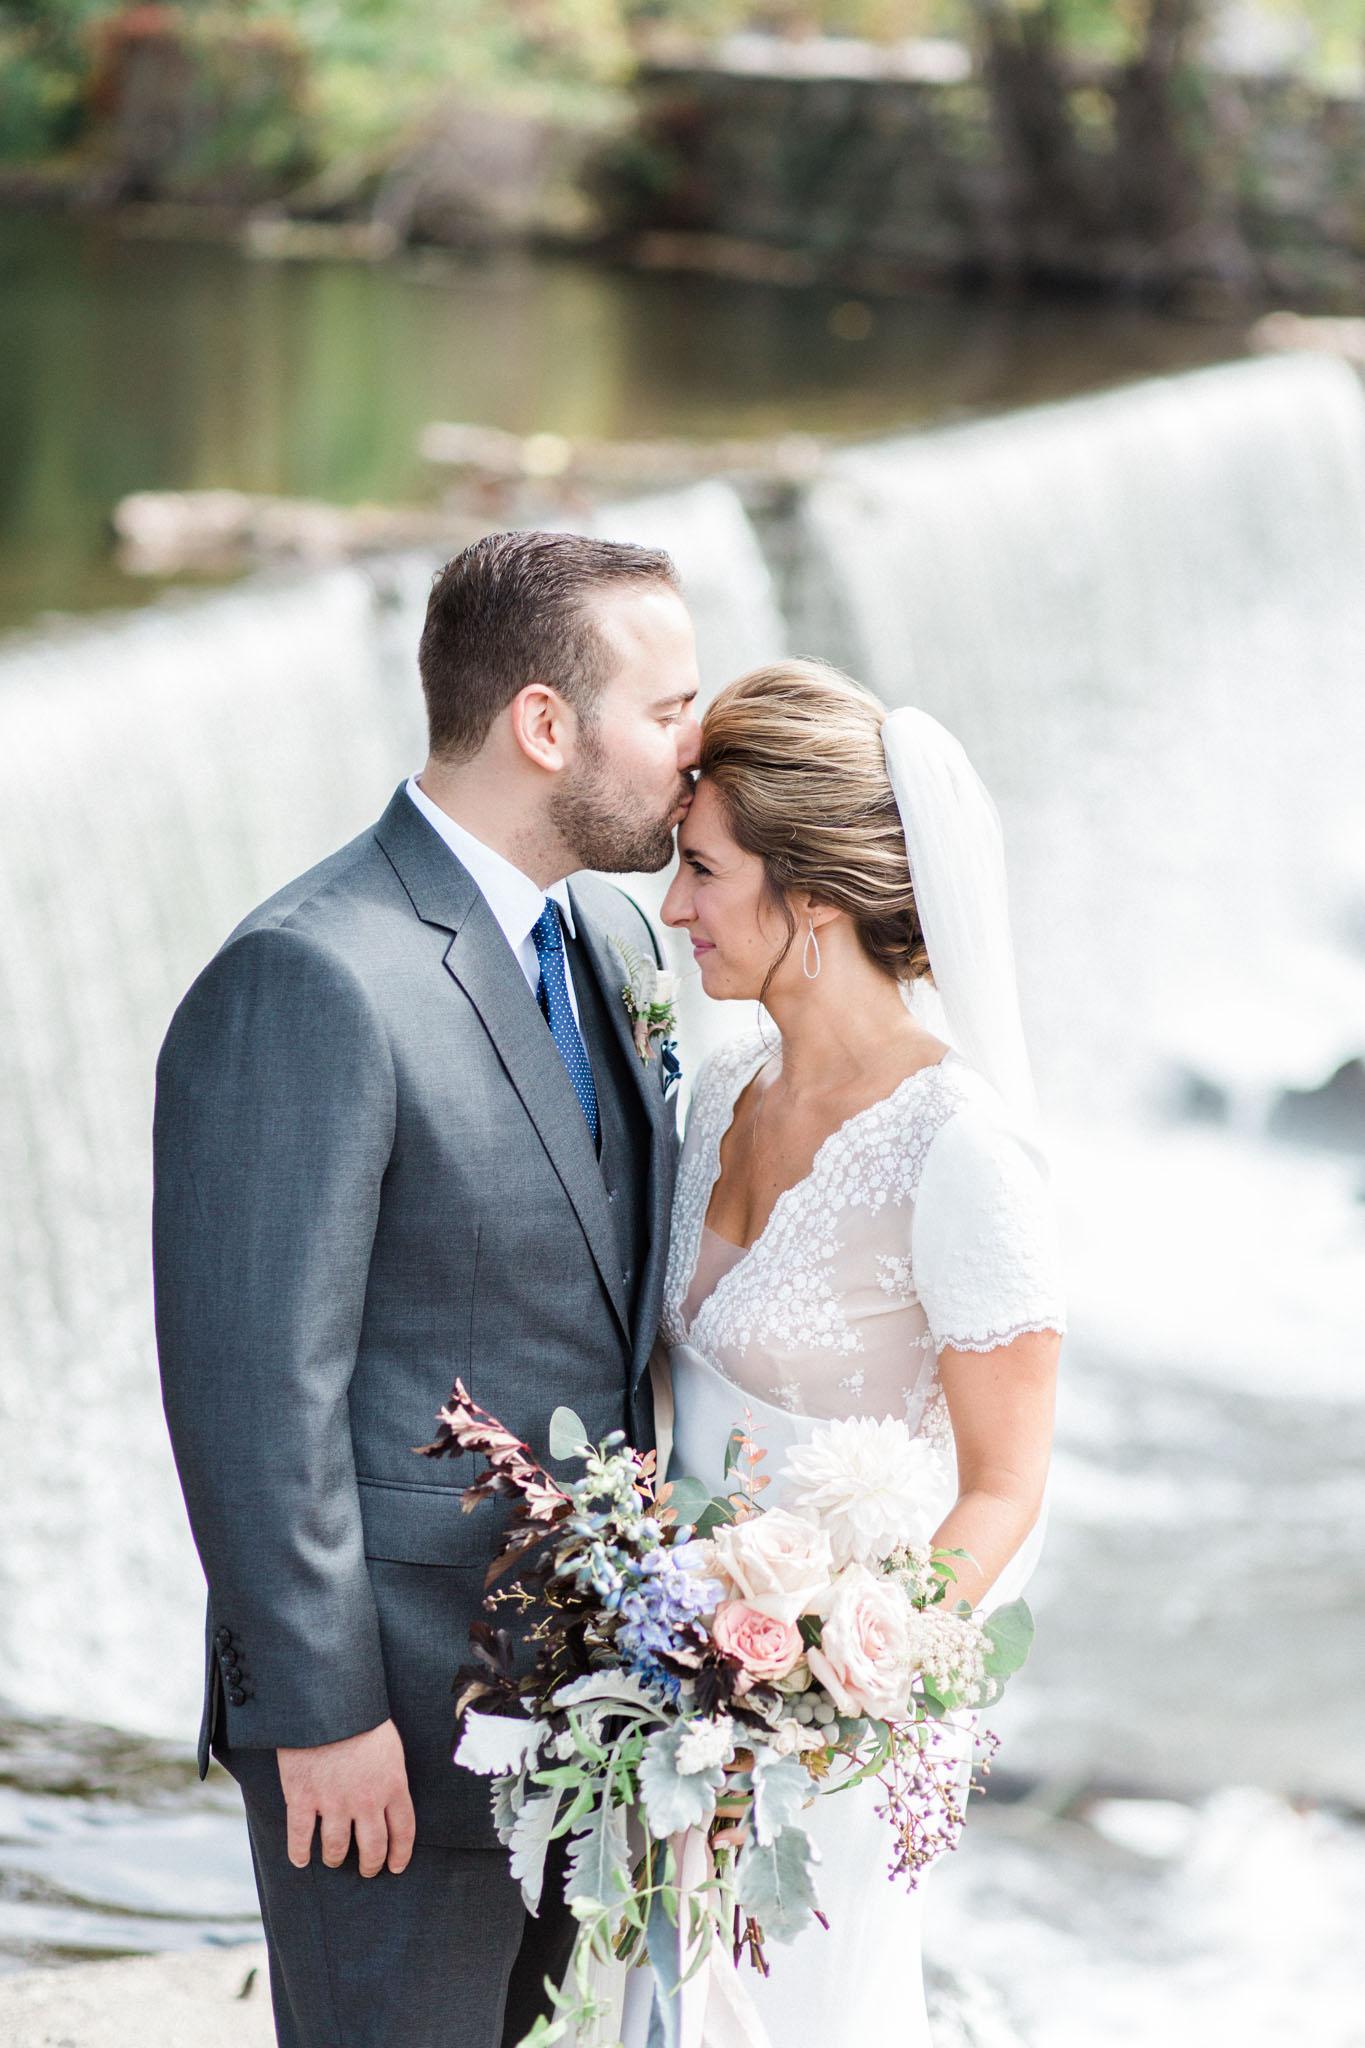 HiloandGinger-Brian+Dina_Weddingday_SneakPeek-12.jpg